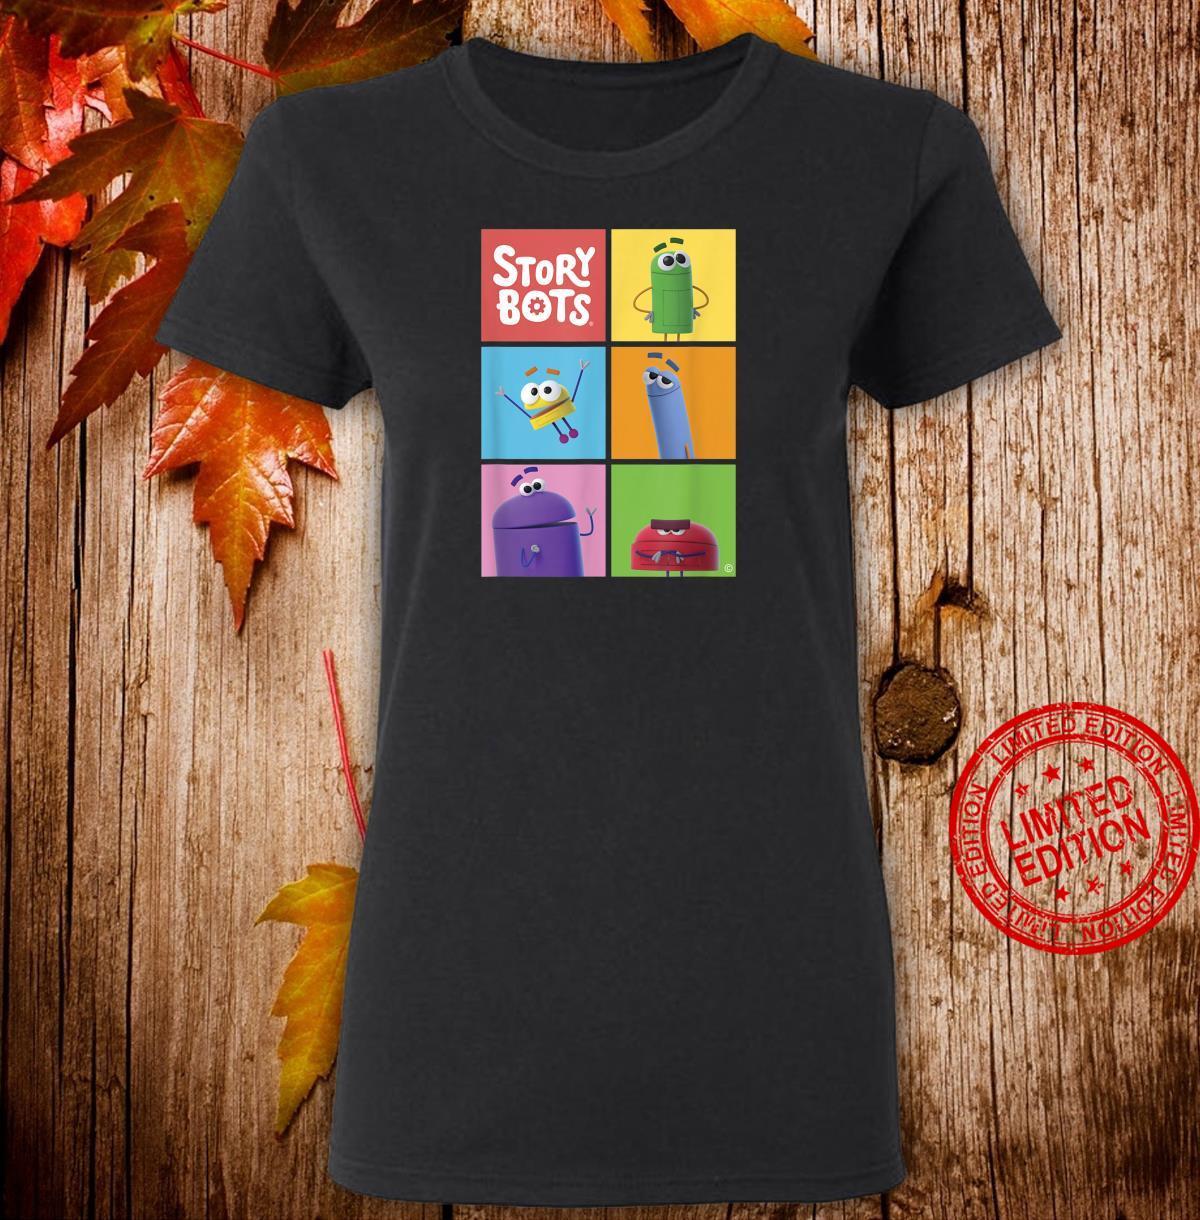 StoryBots Group Shot Panels Shirt ladies tee